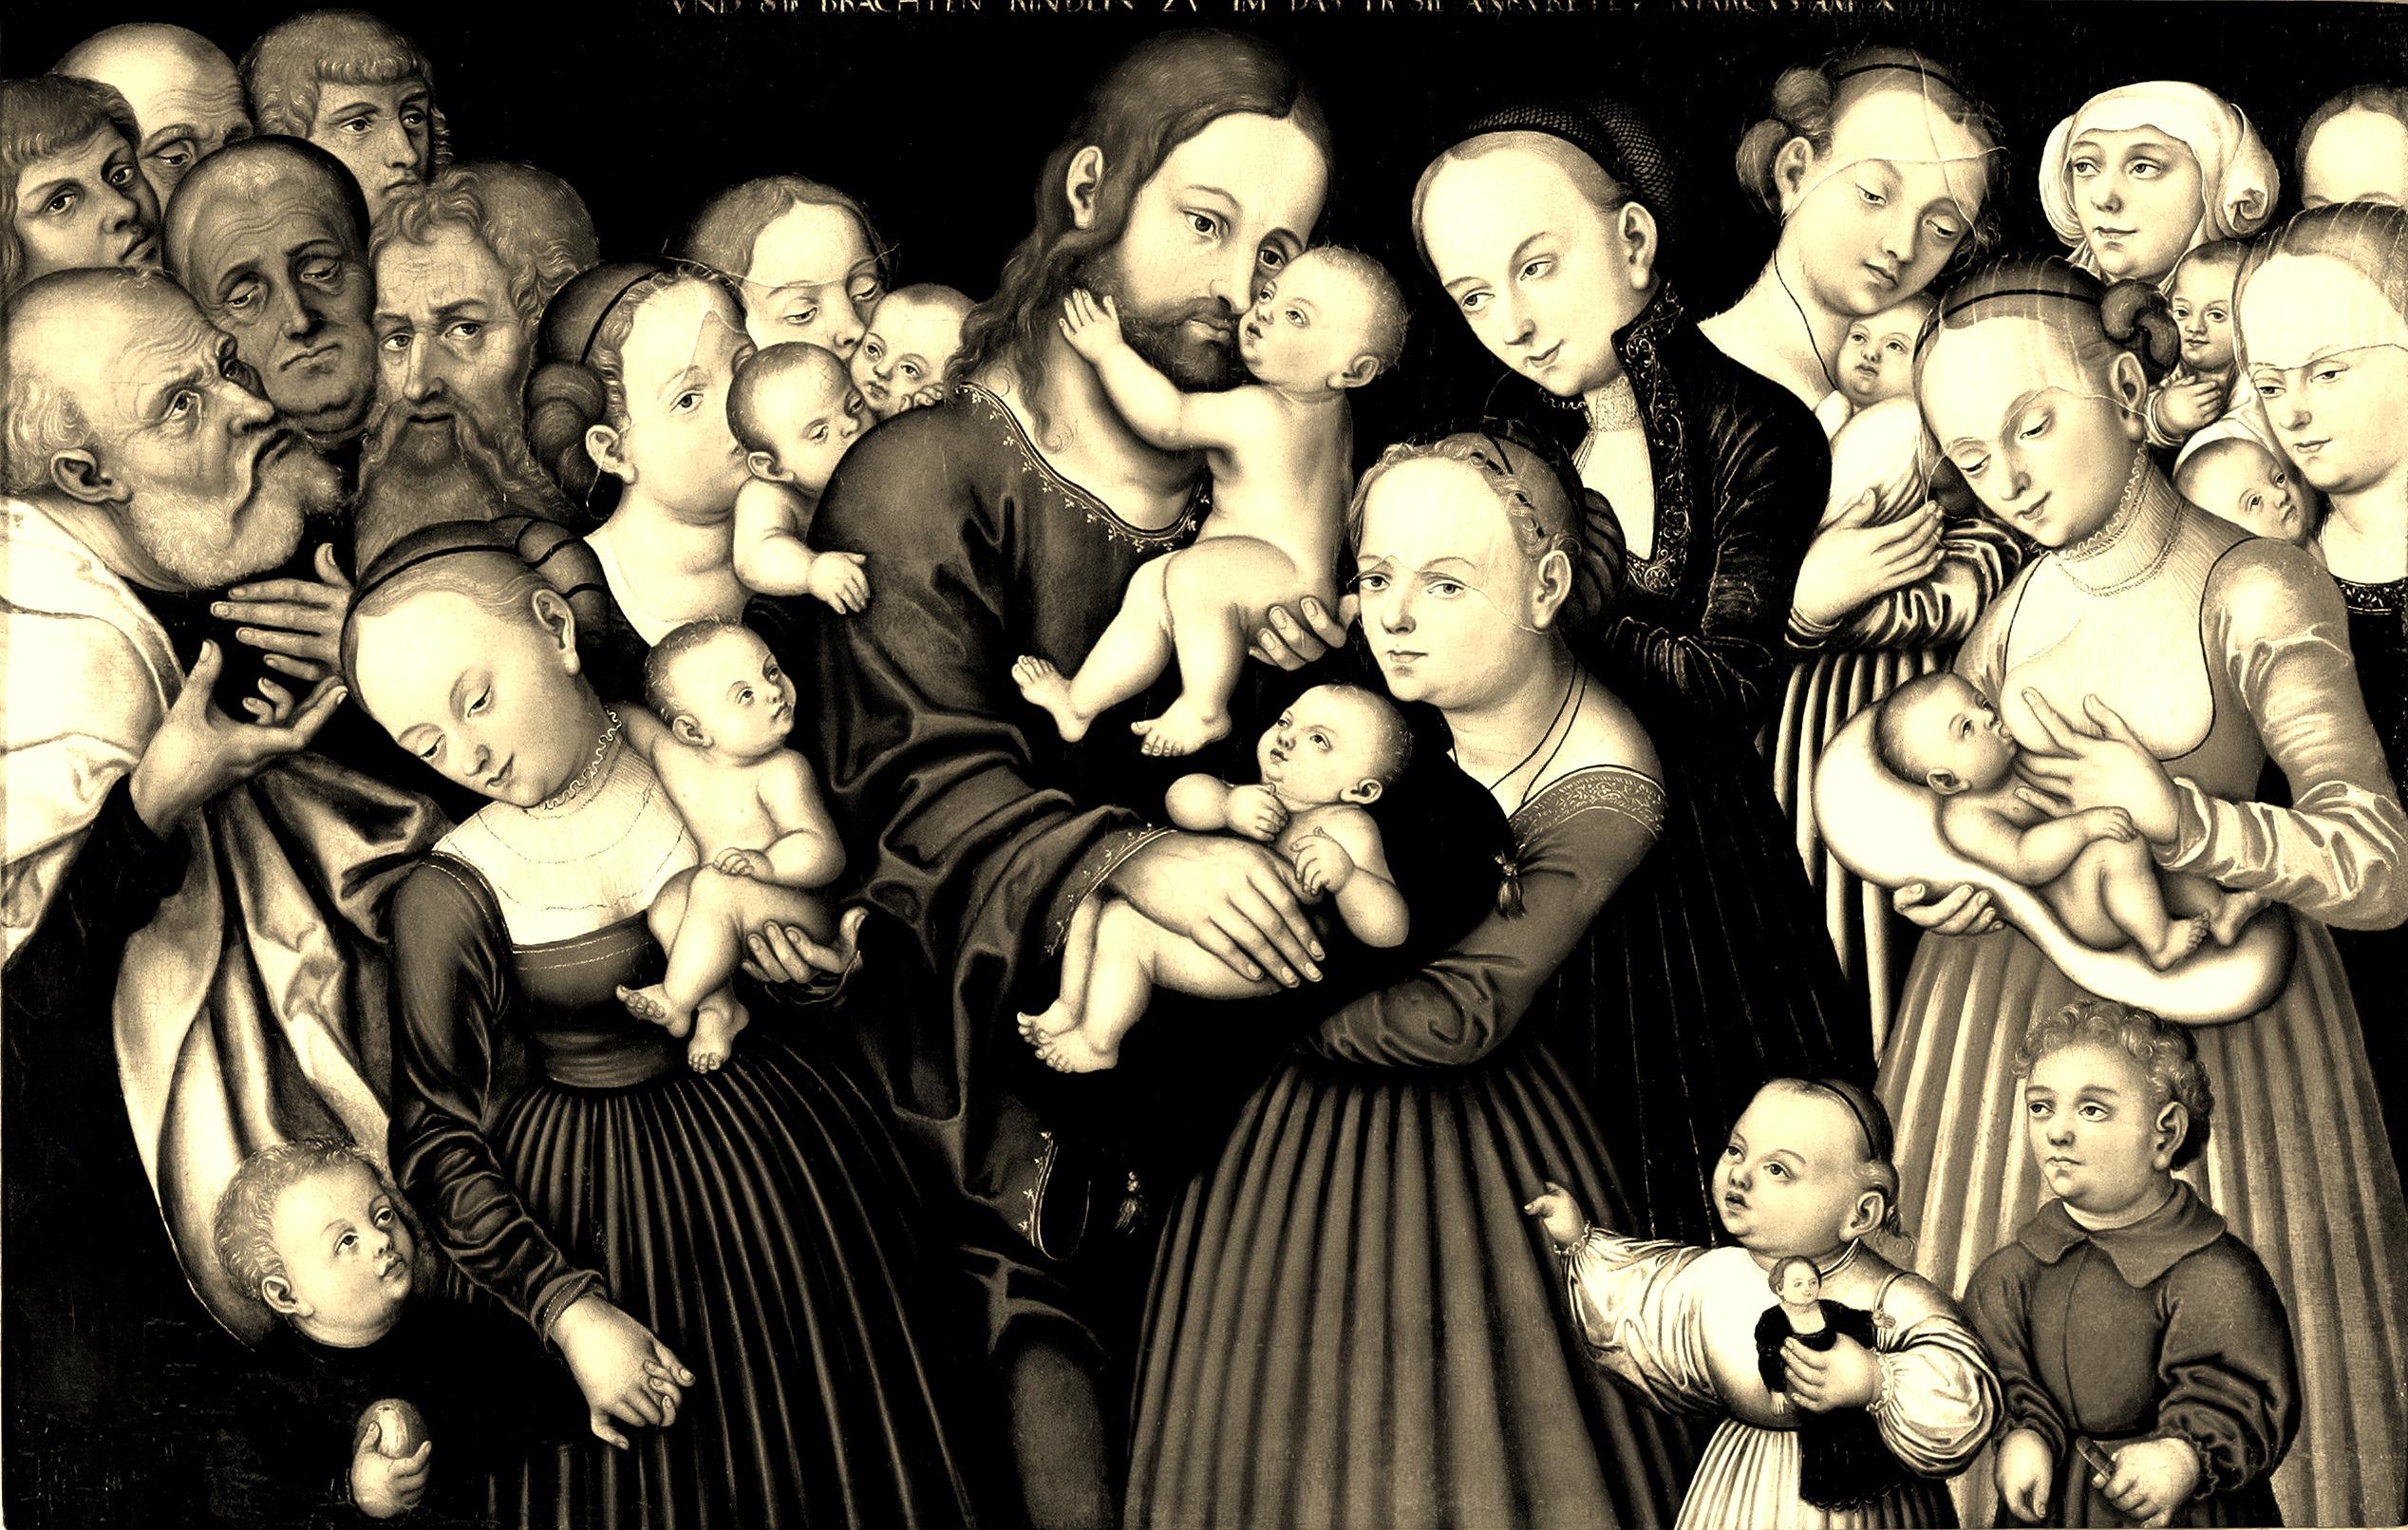 cranach_the_elder_christ_blessing_the_children_1.jpg